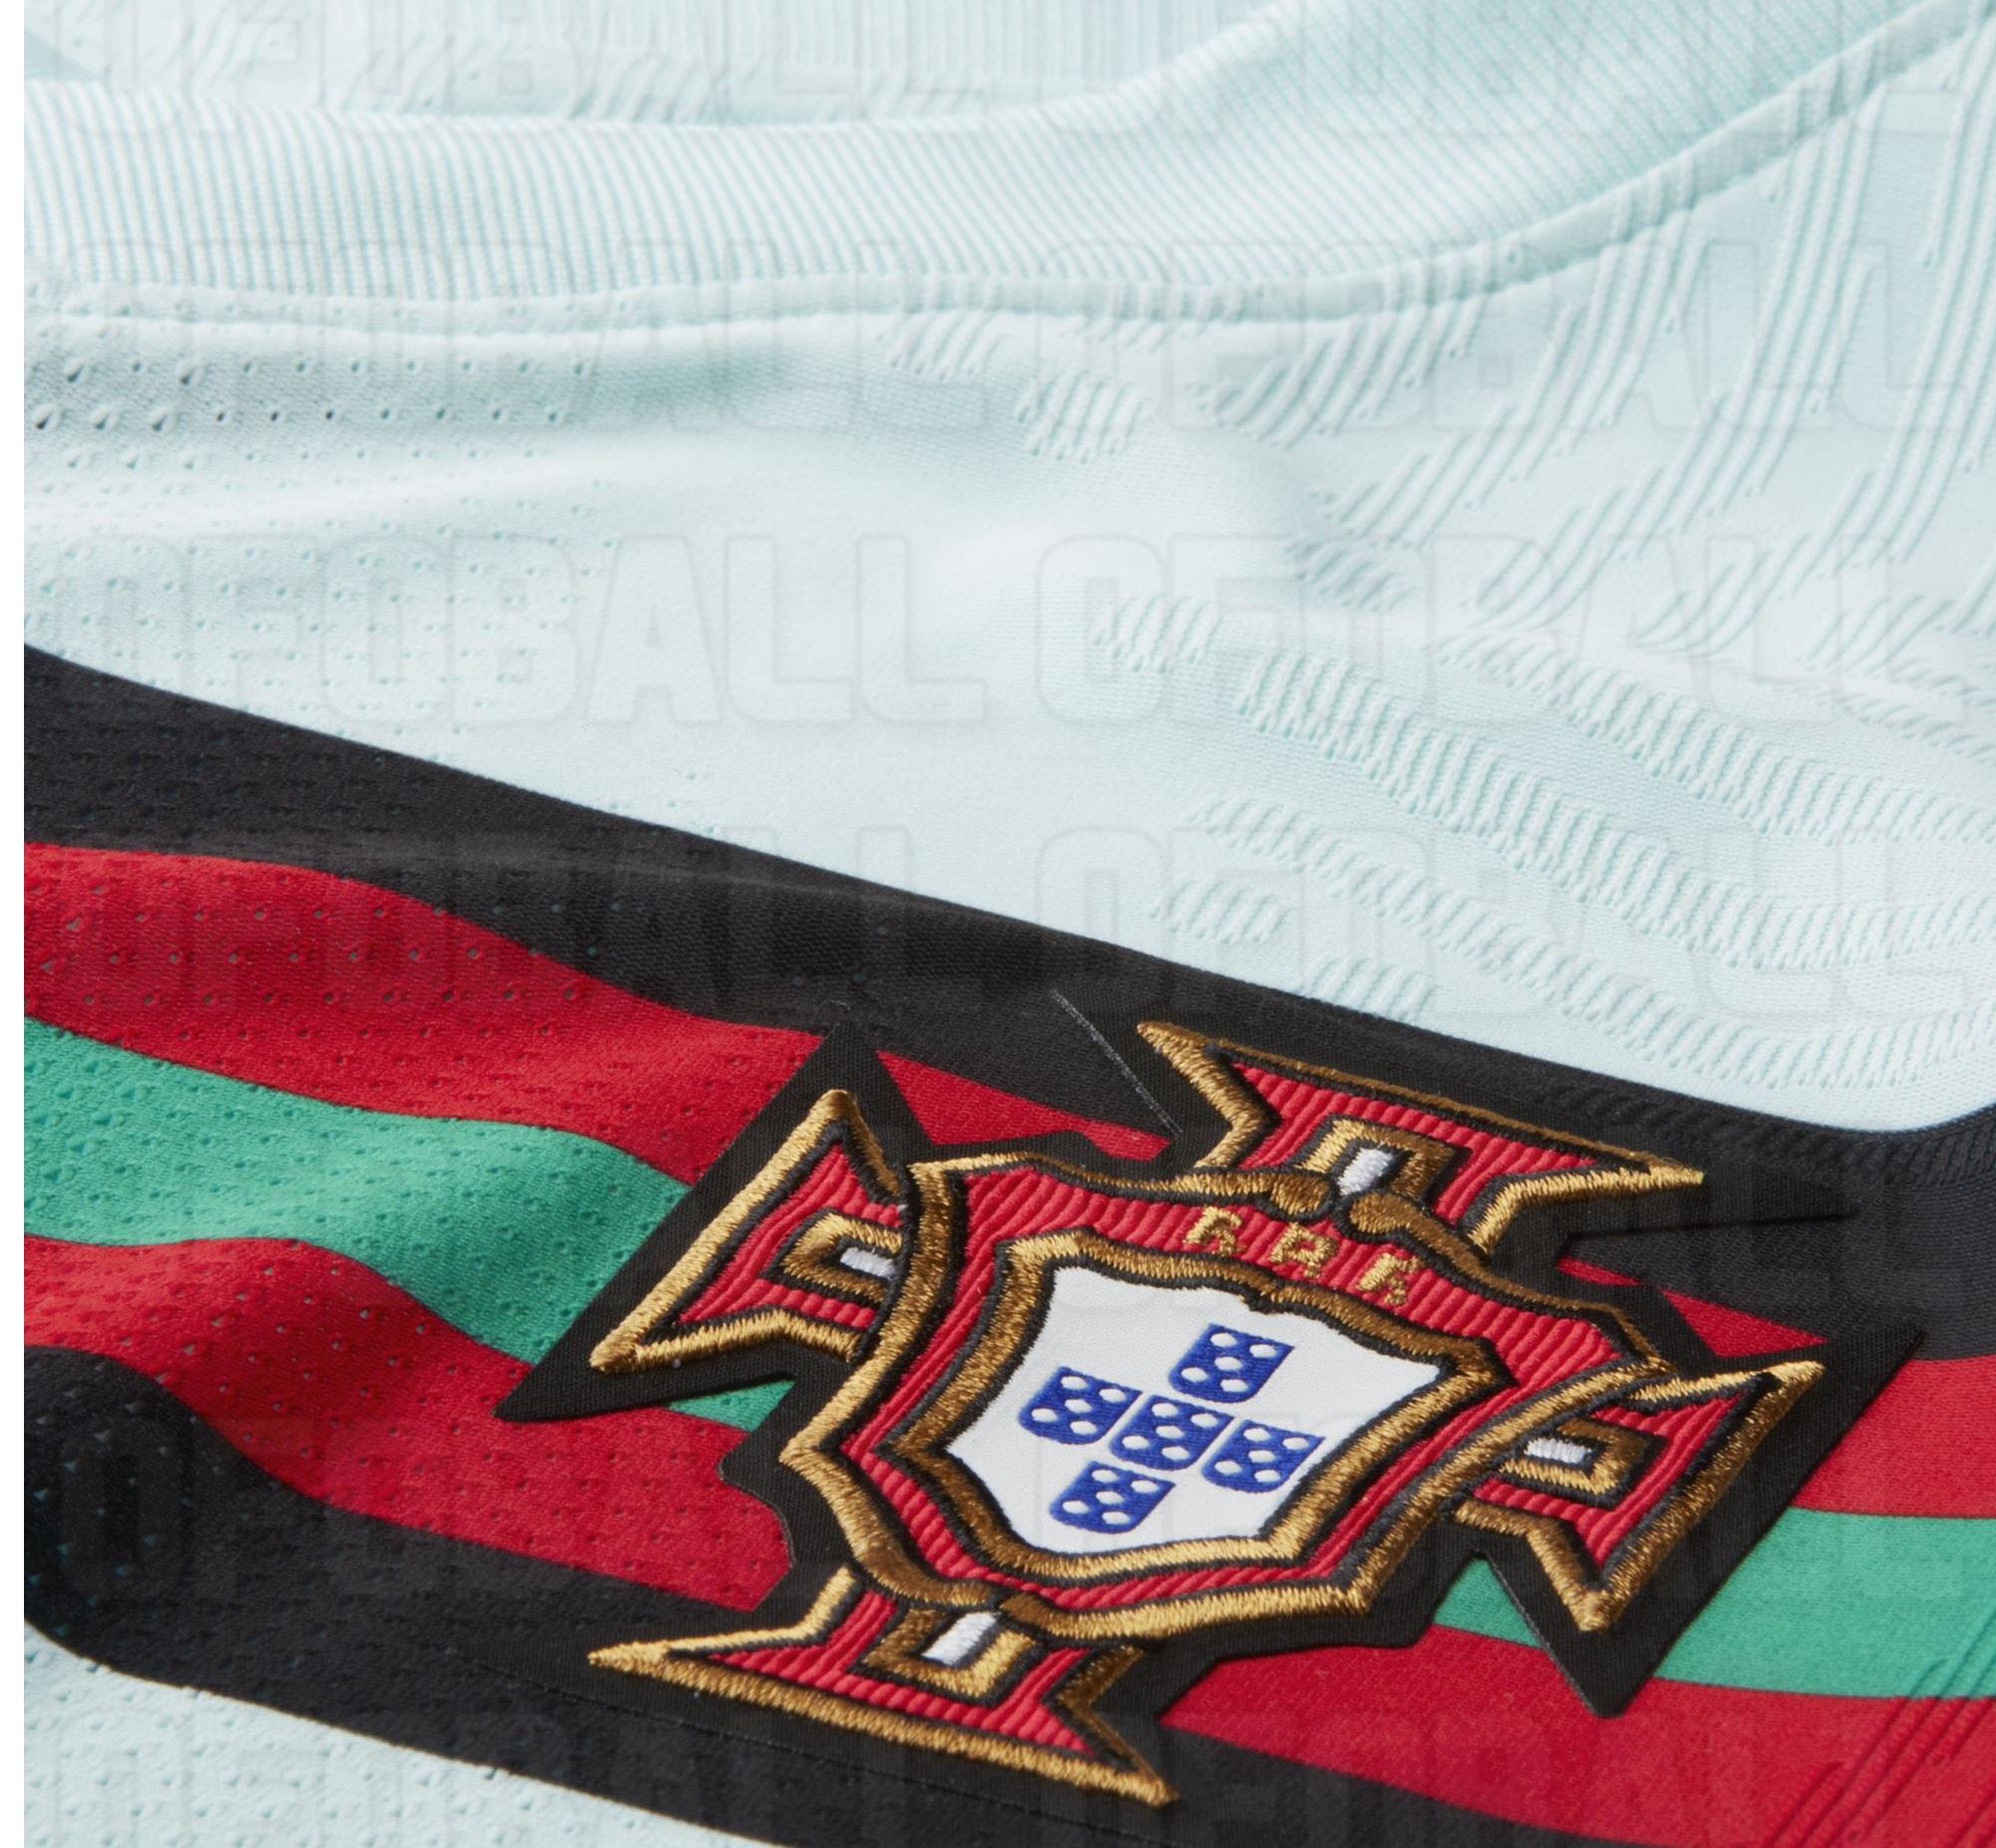 Portugal maillot exterieur foot Euro 2020 details blason